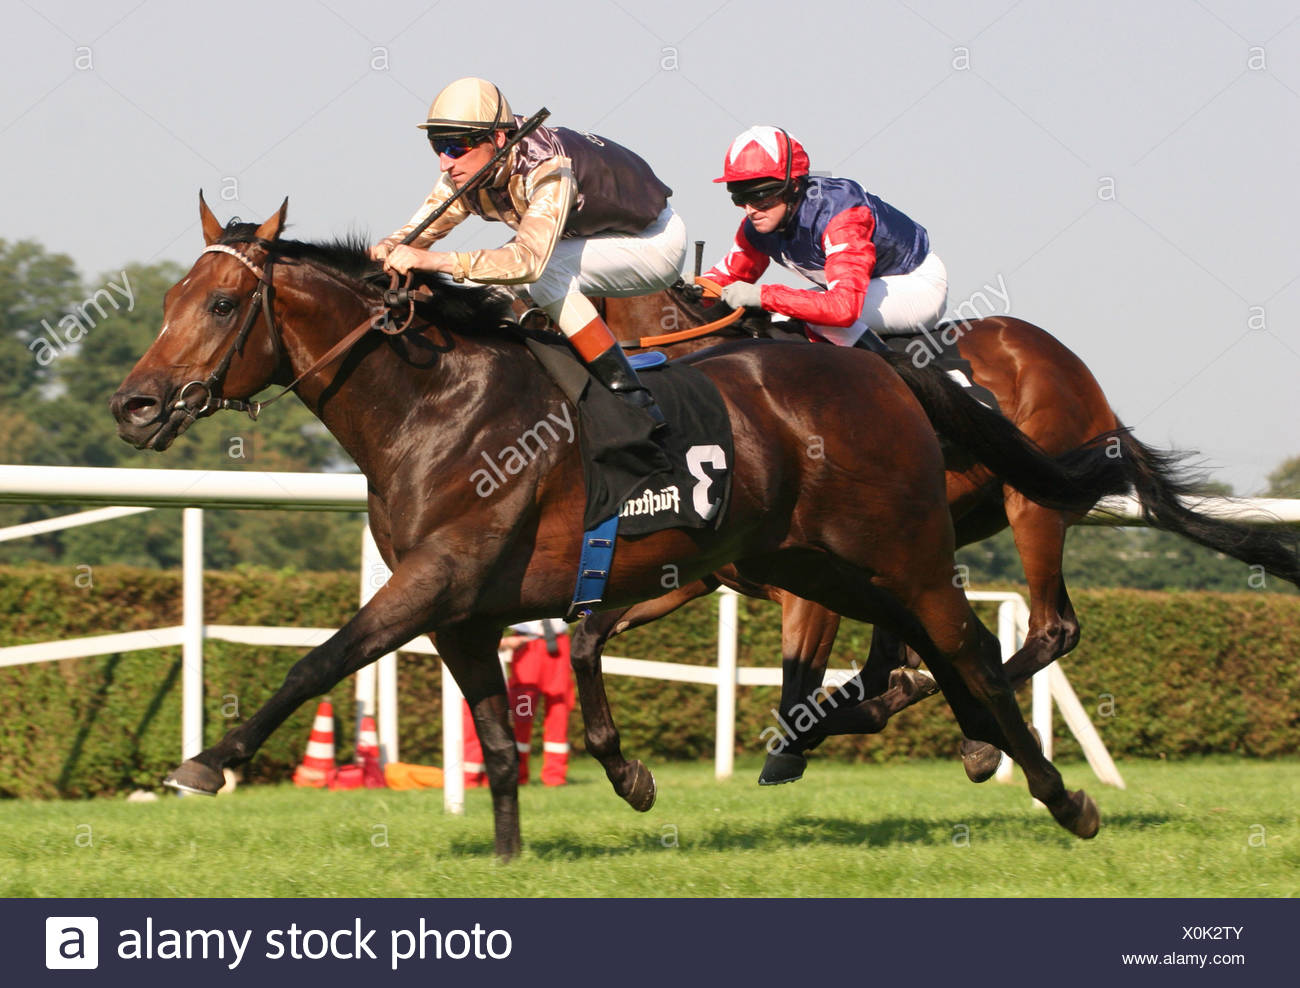 goal intakes 109 prince mountain running horse Day Walker and Jockey Andrasch Starke, Germany, Baden-Wuerttemberg, Baden-Baden - Stock Image